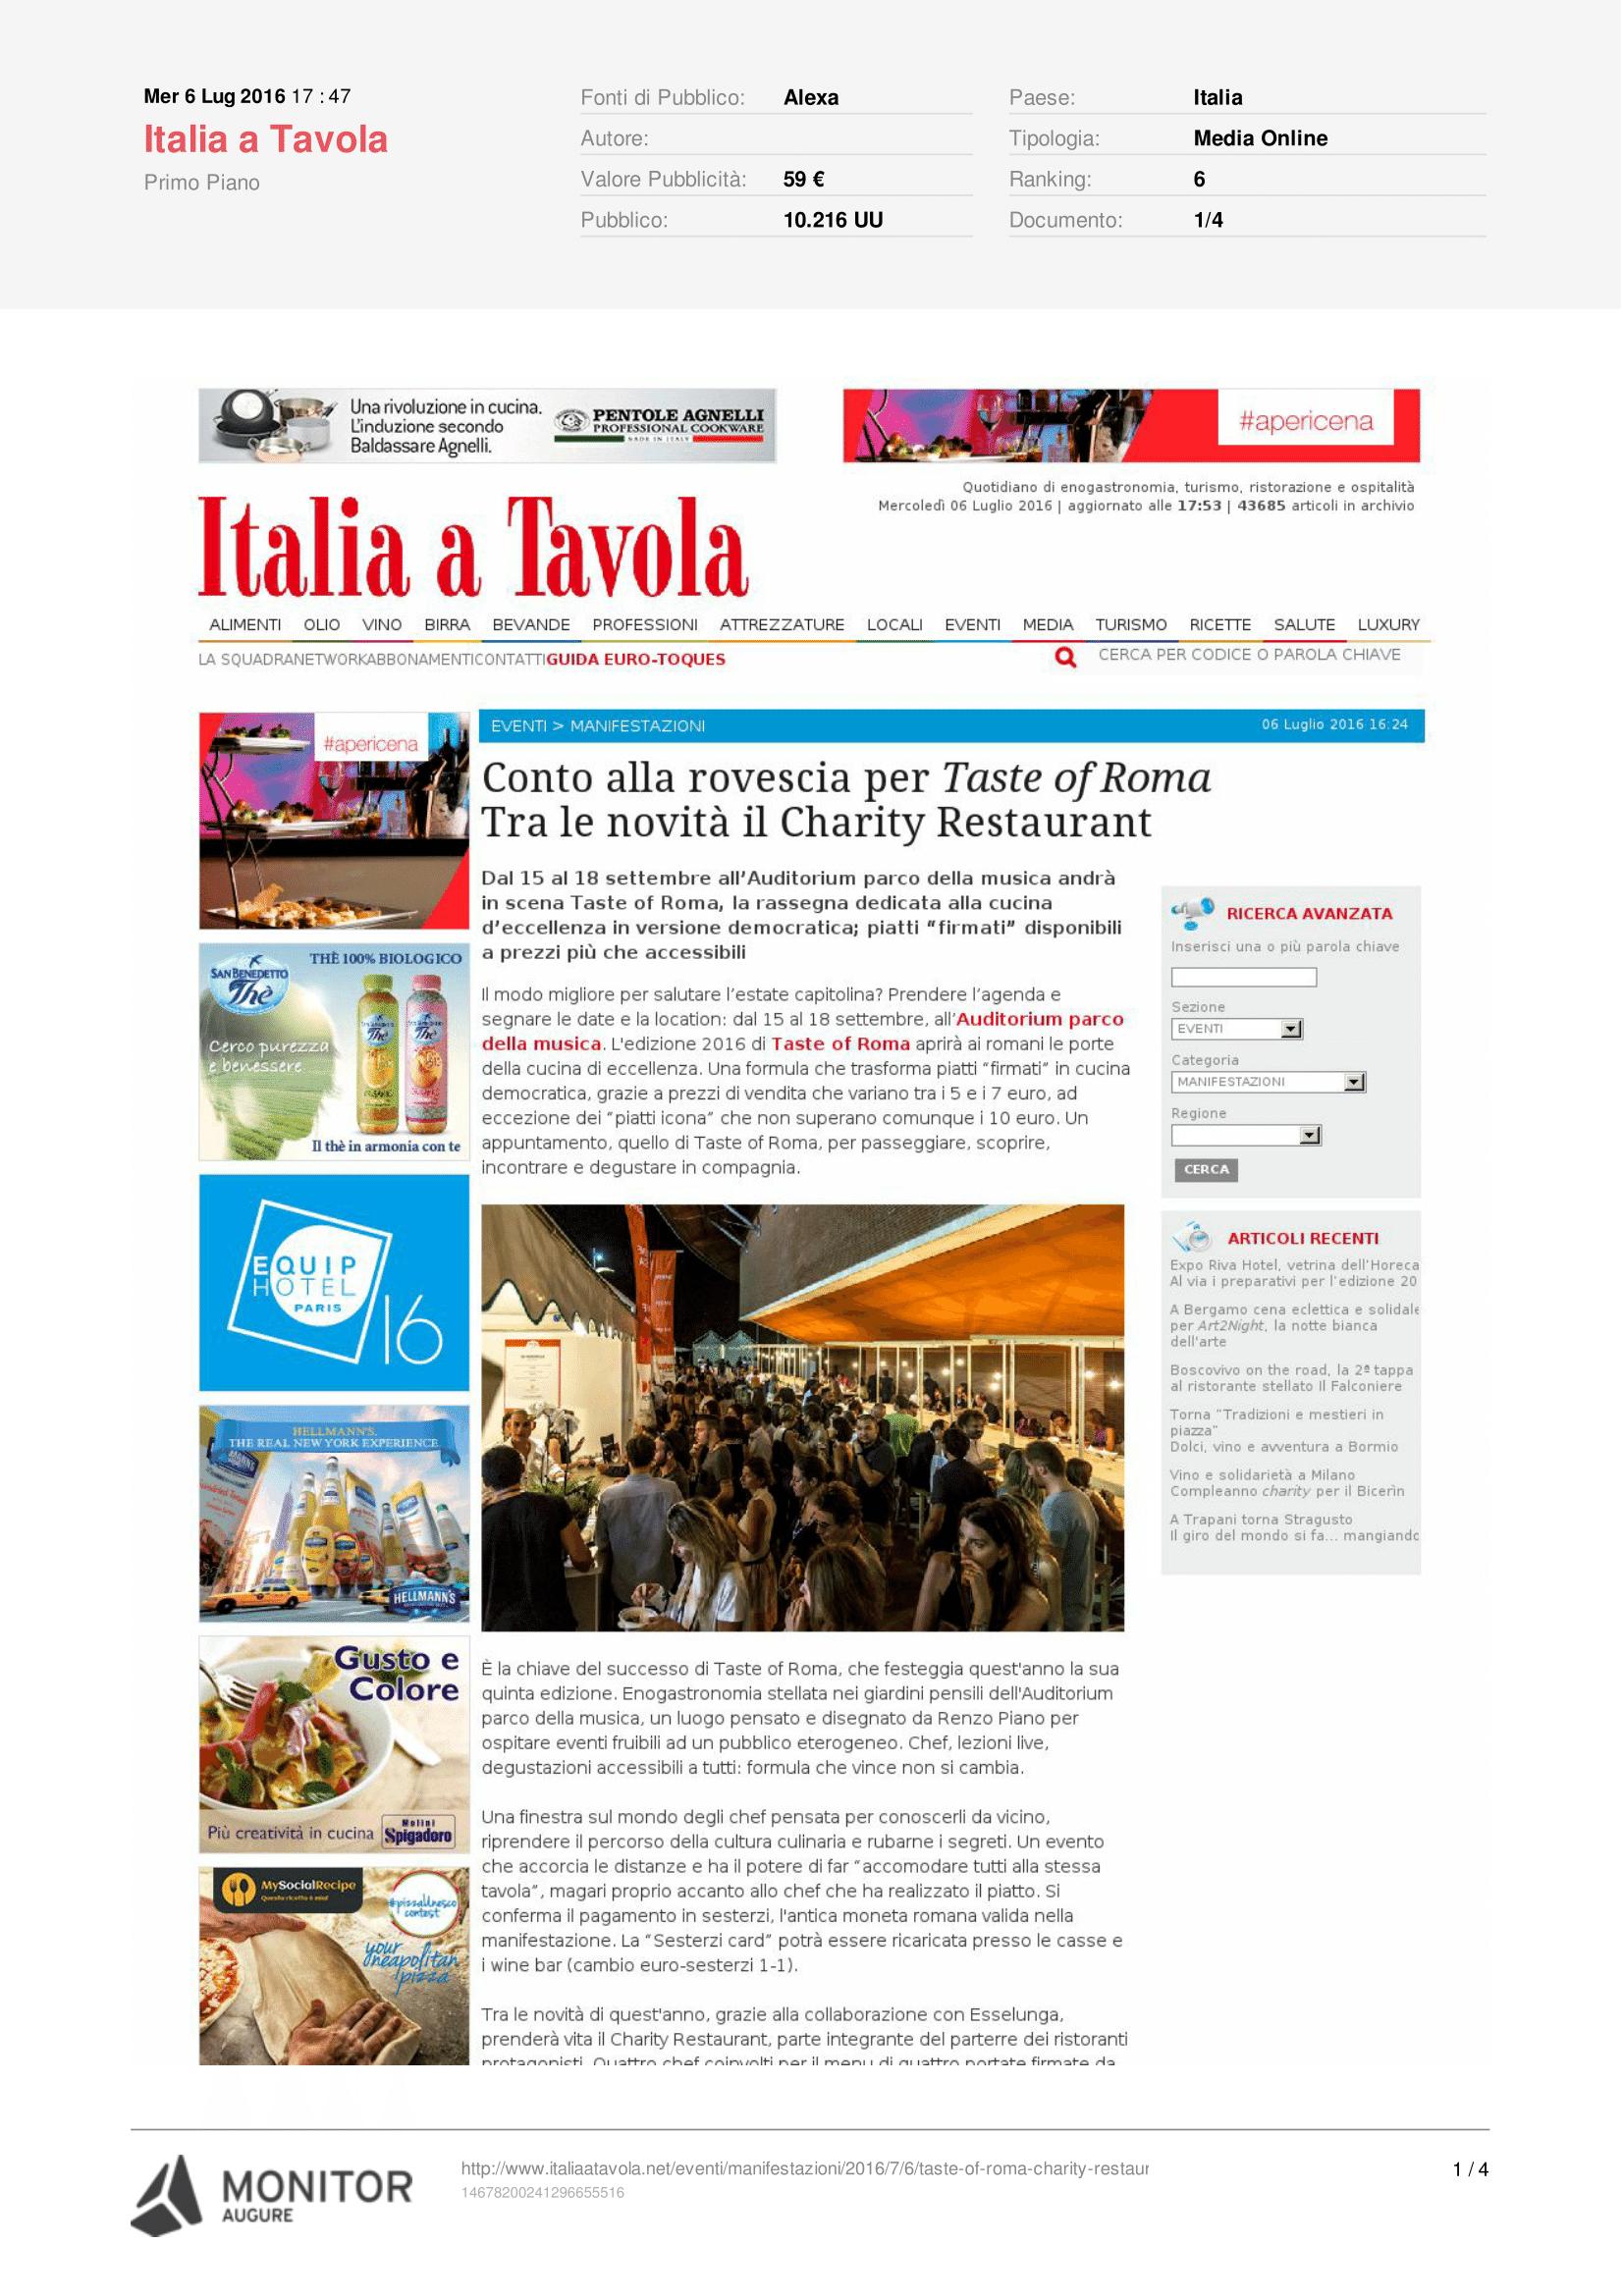 06.07.16_italiaatavola.net-1